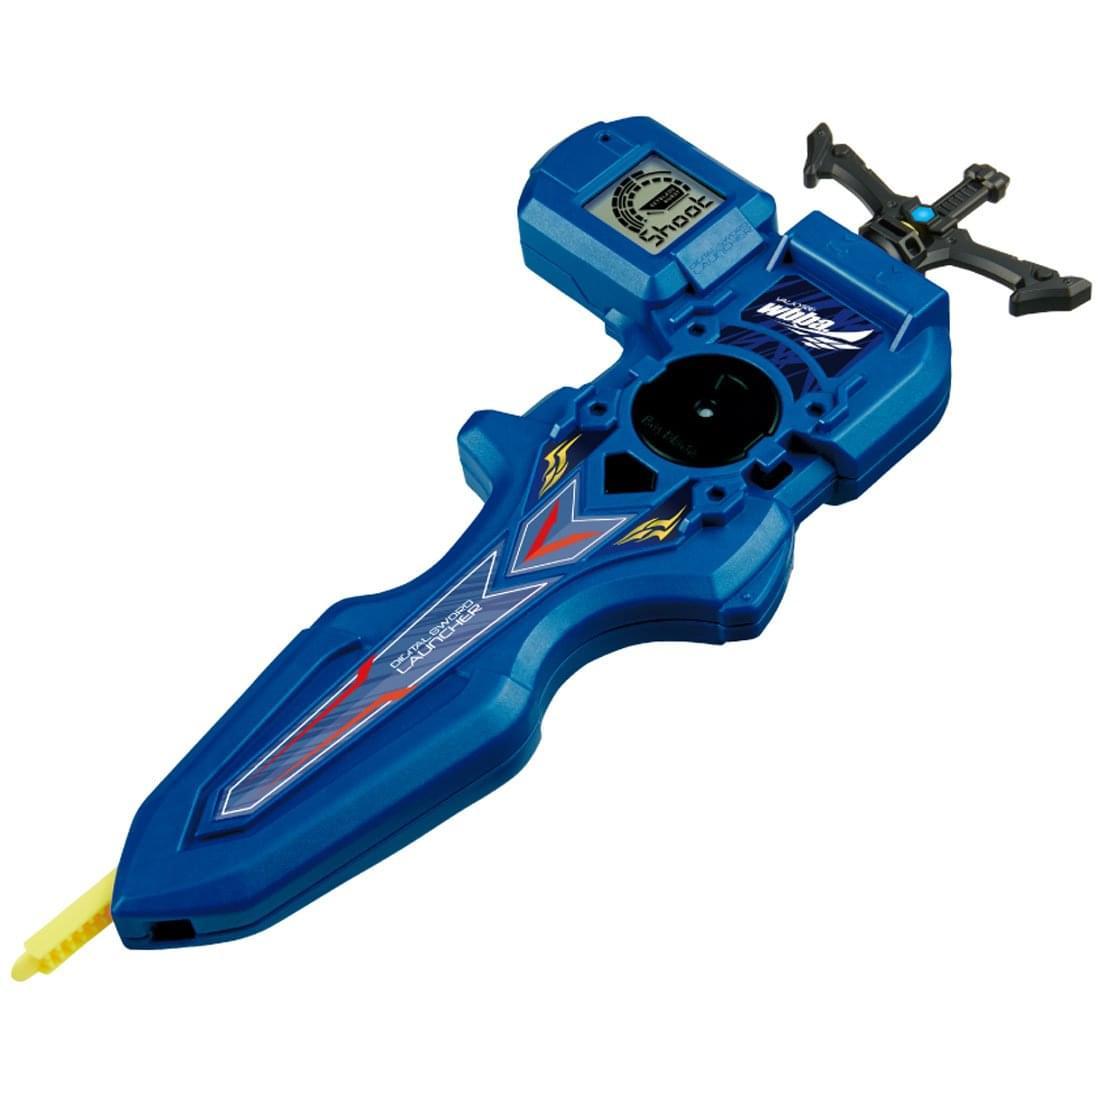 Beyblade Burst Takaratomy B-93 Digital Sword Launcher Blue